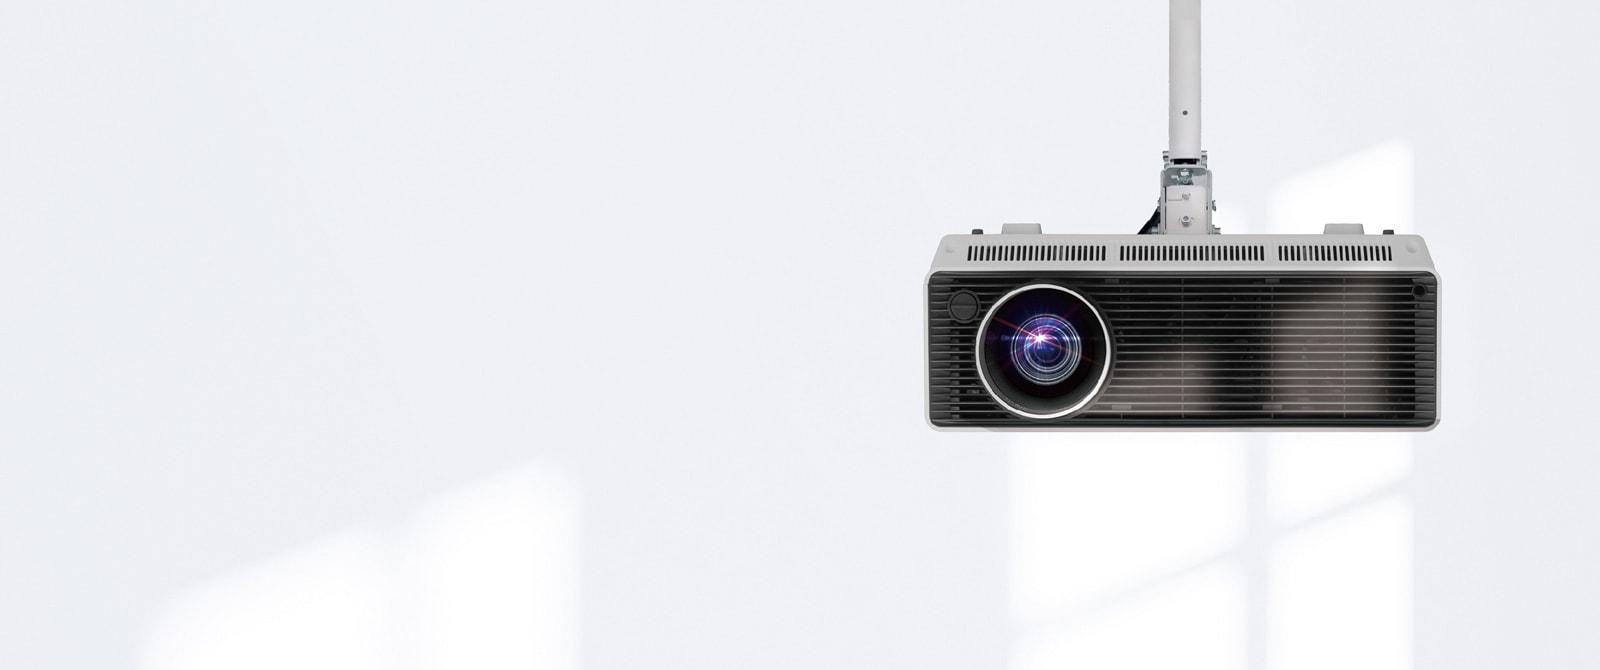 LG ProBeam 4K Laser Projector 5,000 ANSI Lumens Brightness